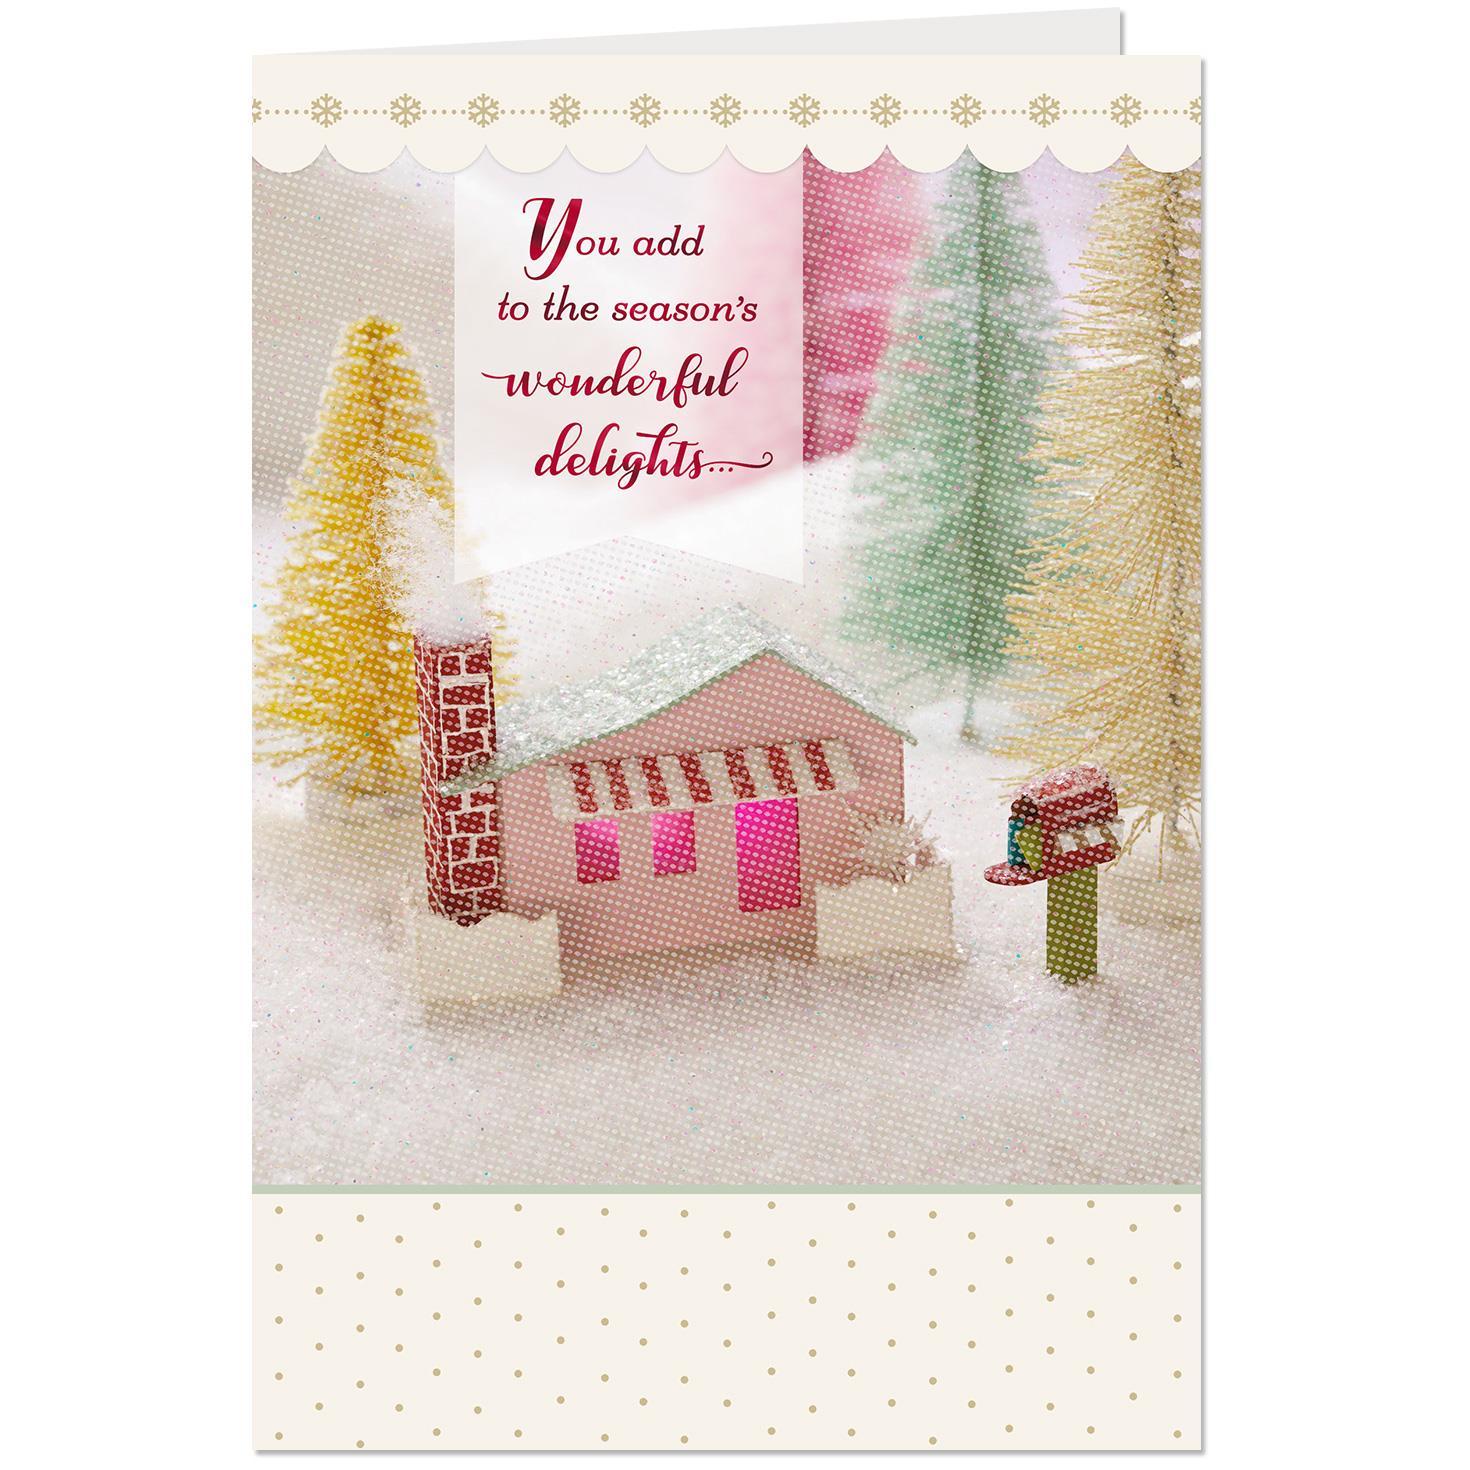 Miniature House Vignette Christmas Card For Service Provider